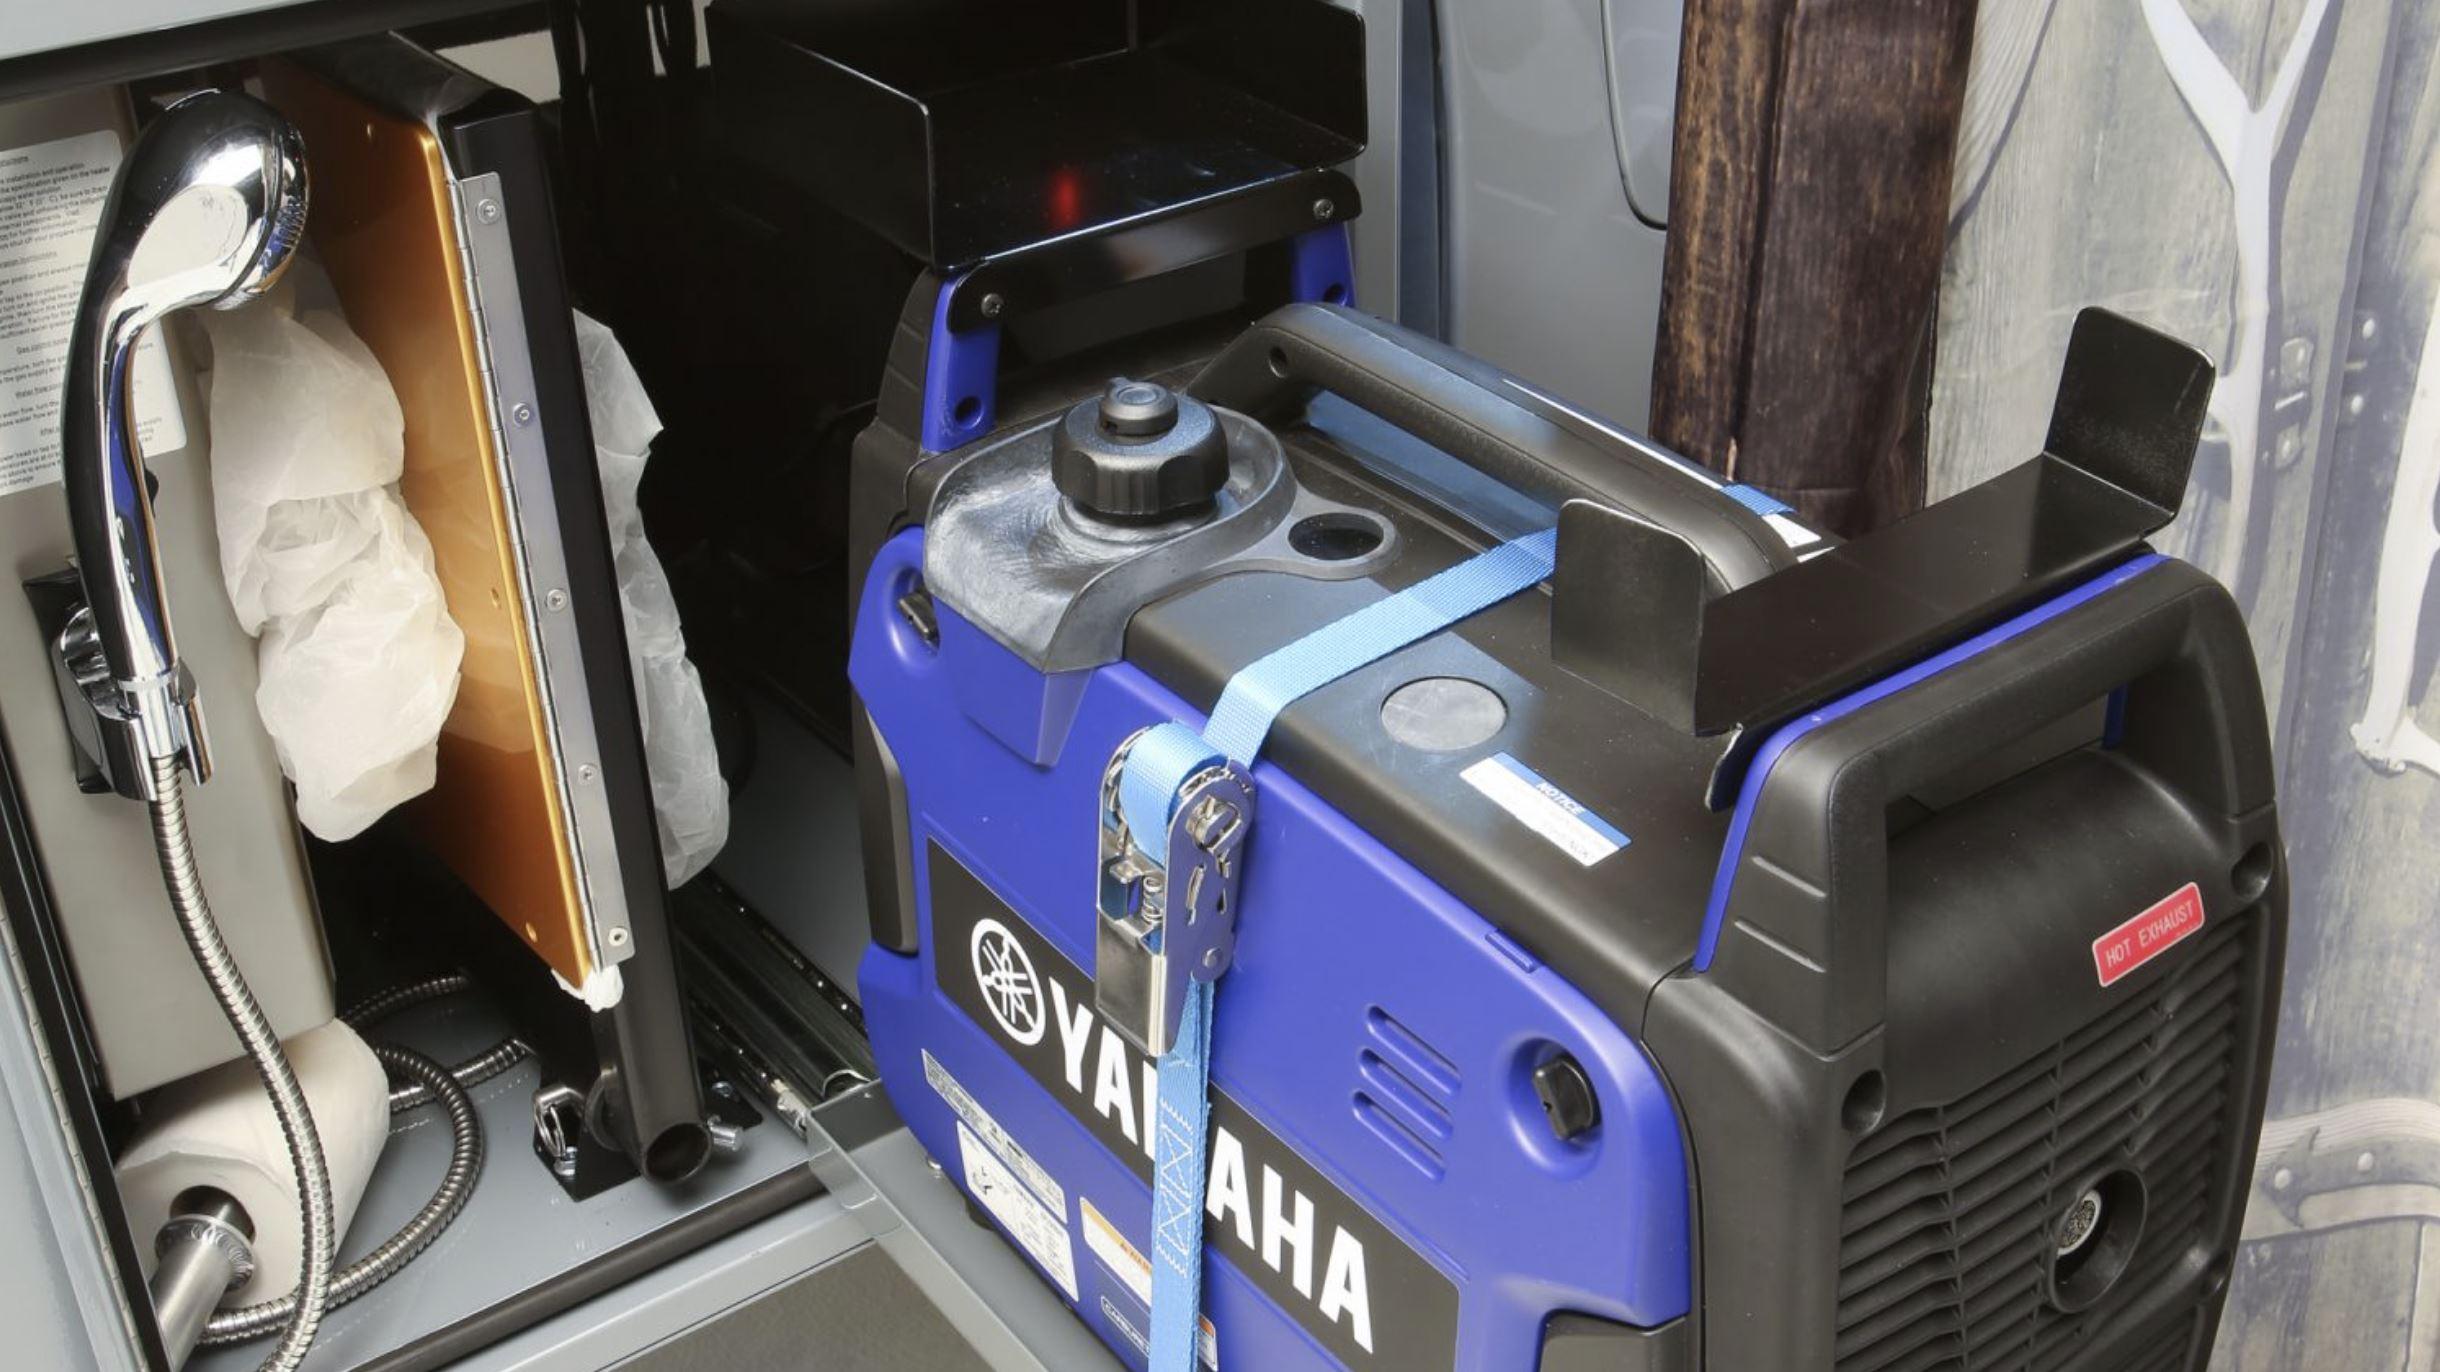 Yamaha Generator on Toyota TRD Sport Trailer for Camping, Off-Roading & Overlanding